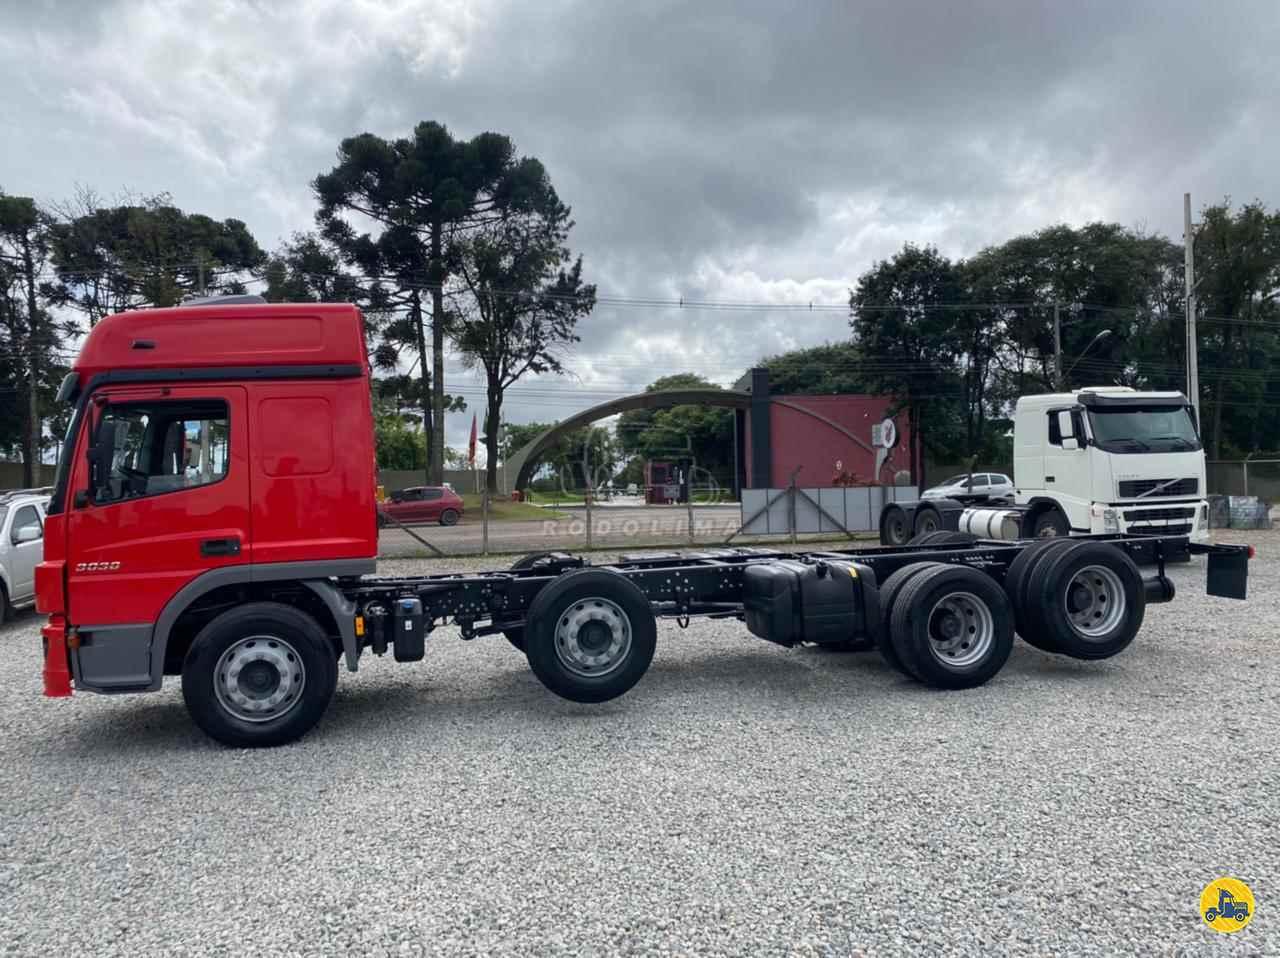 MERCEDES-BENZ MB 3030 0km 2021/2021 Rodolima Caminhões